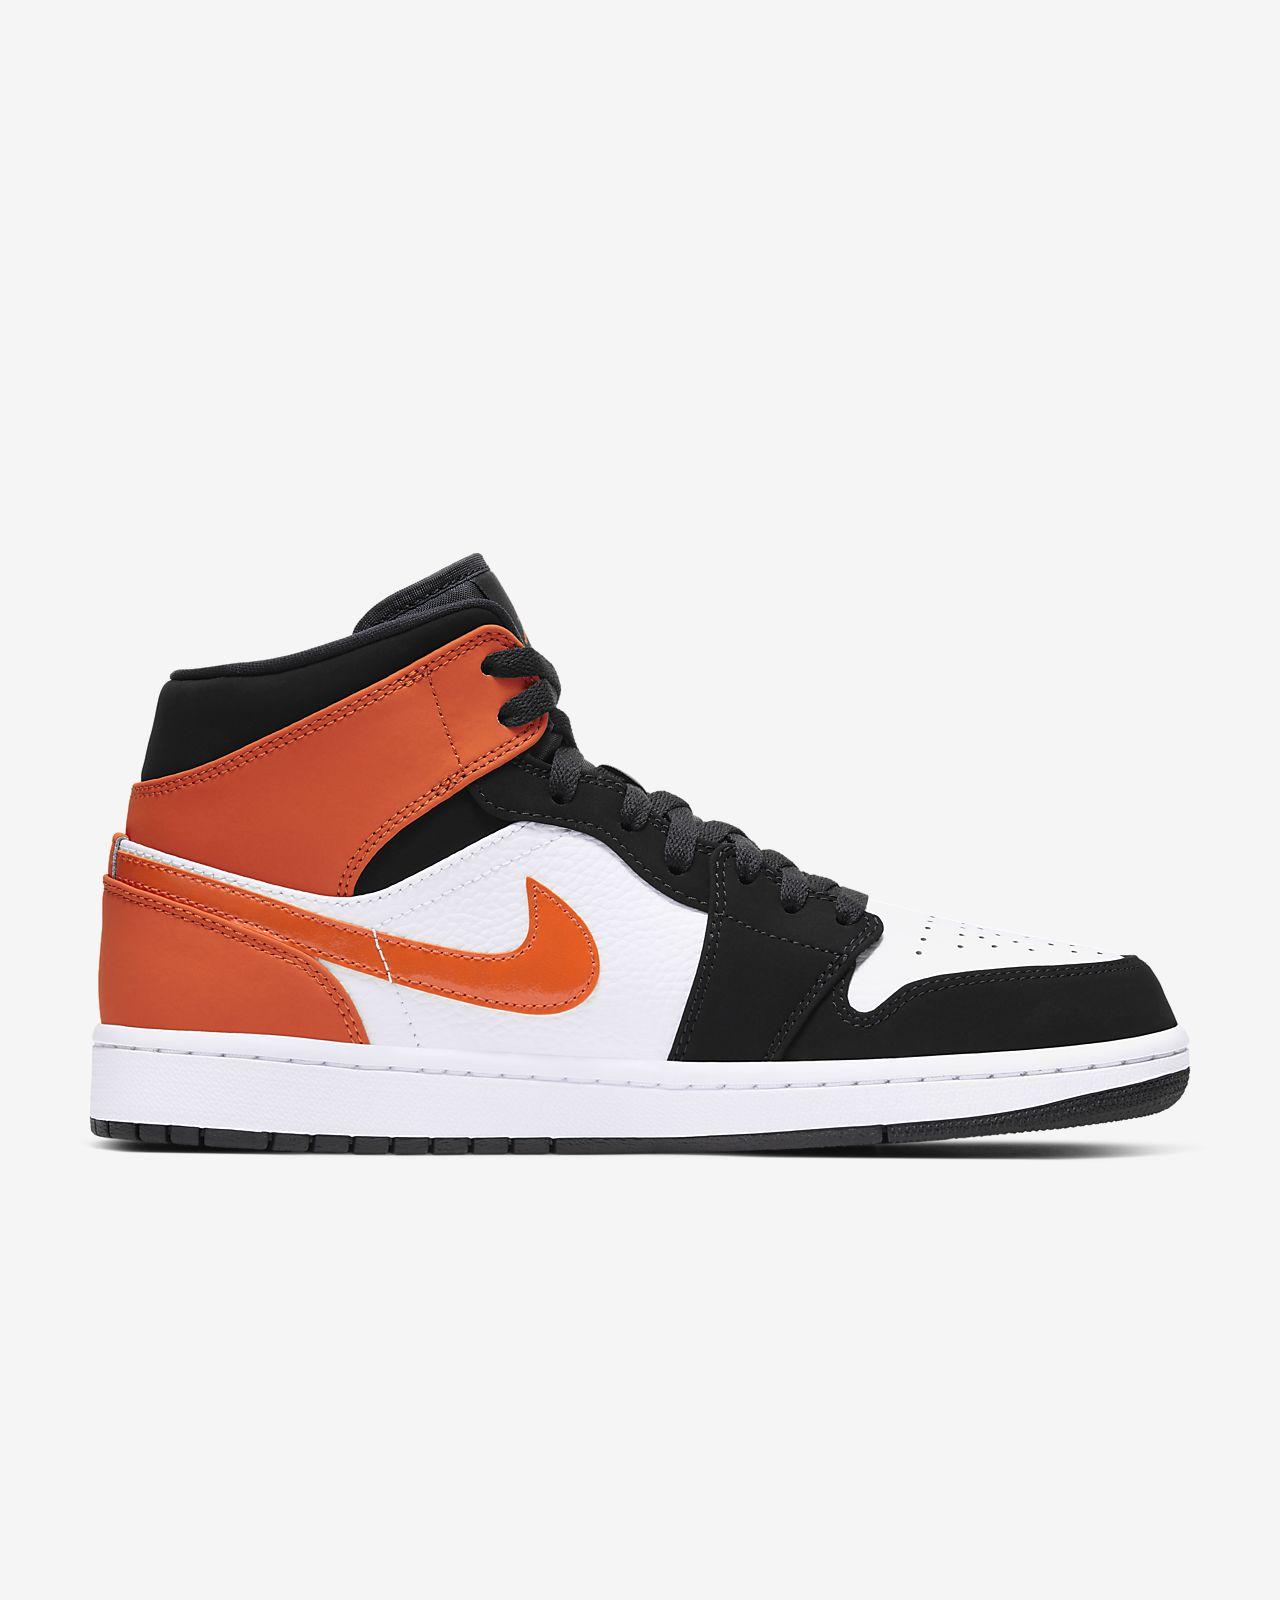 1 Shoe Air Air Jordan Mid 1 Jordan osQhBtrdxC